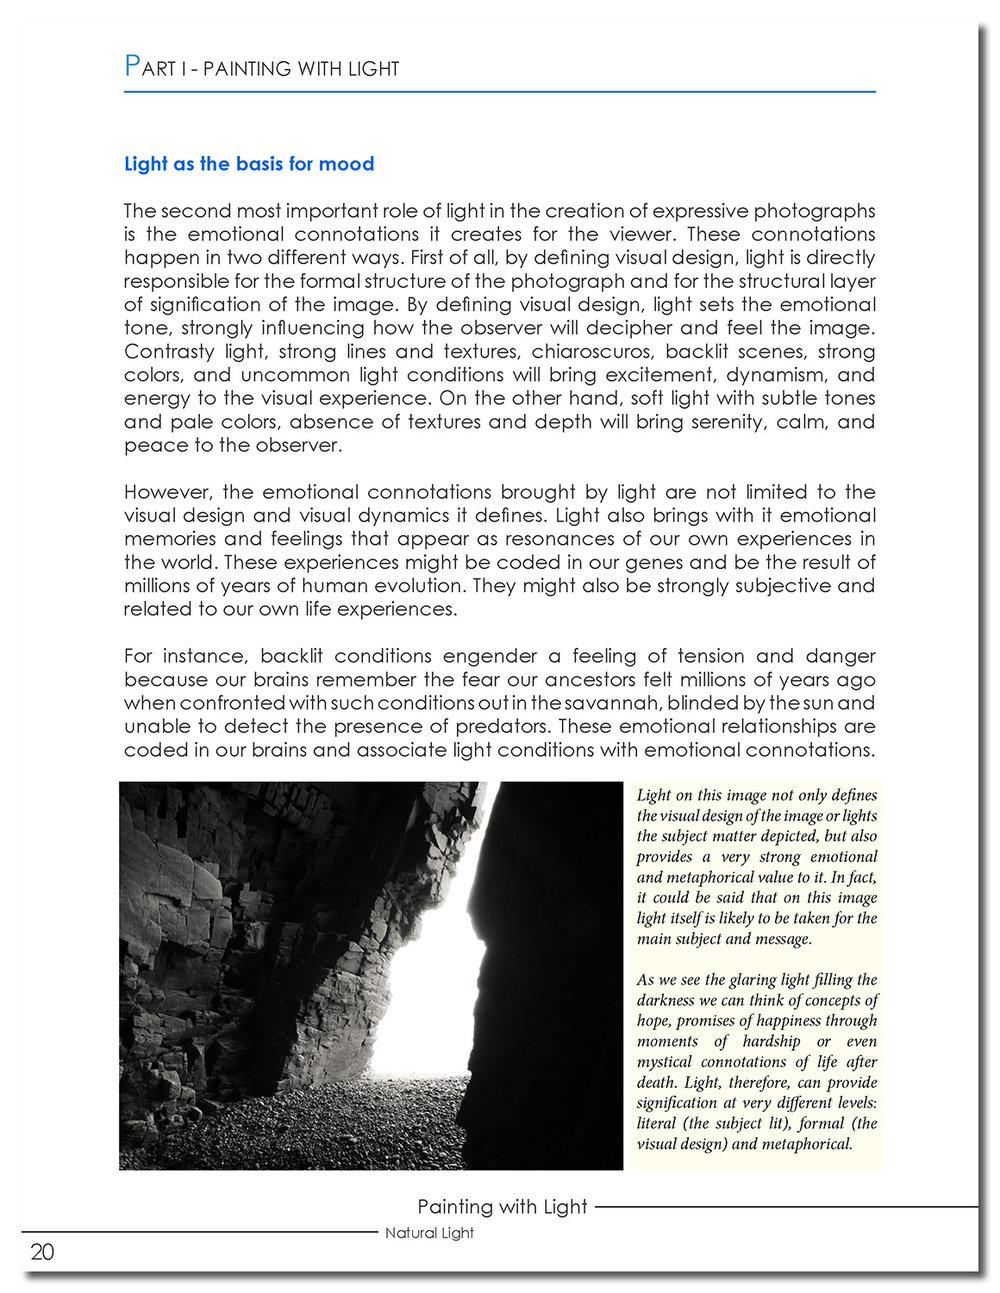 natural light_Page_020 copy.jpg